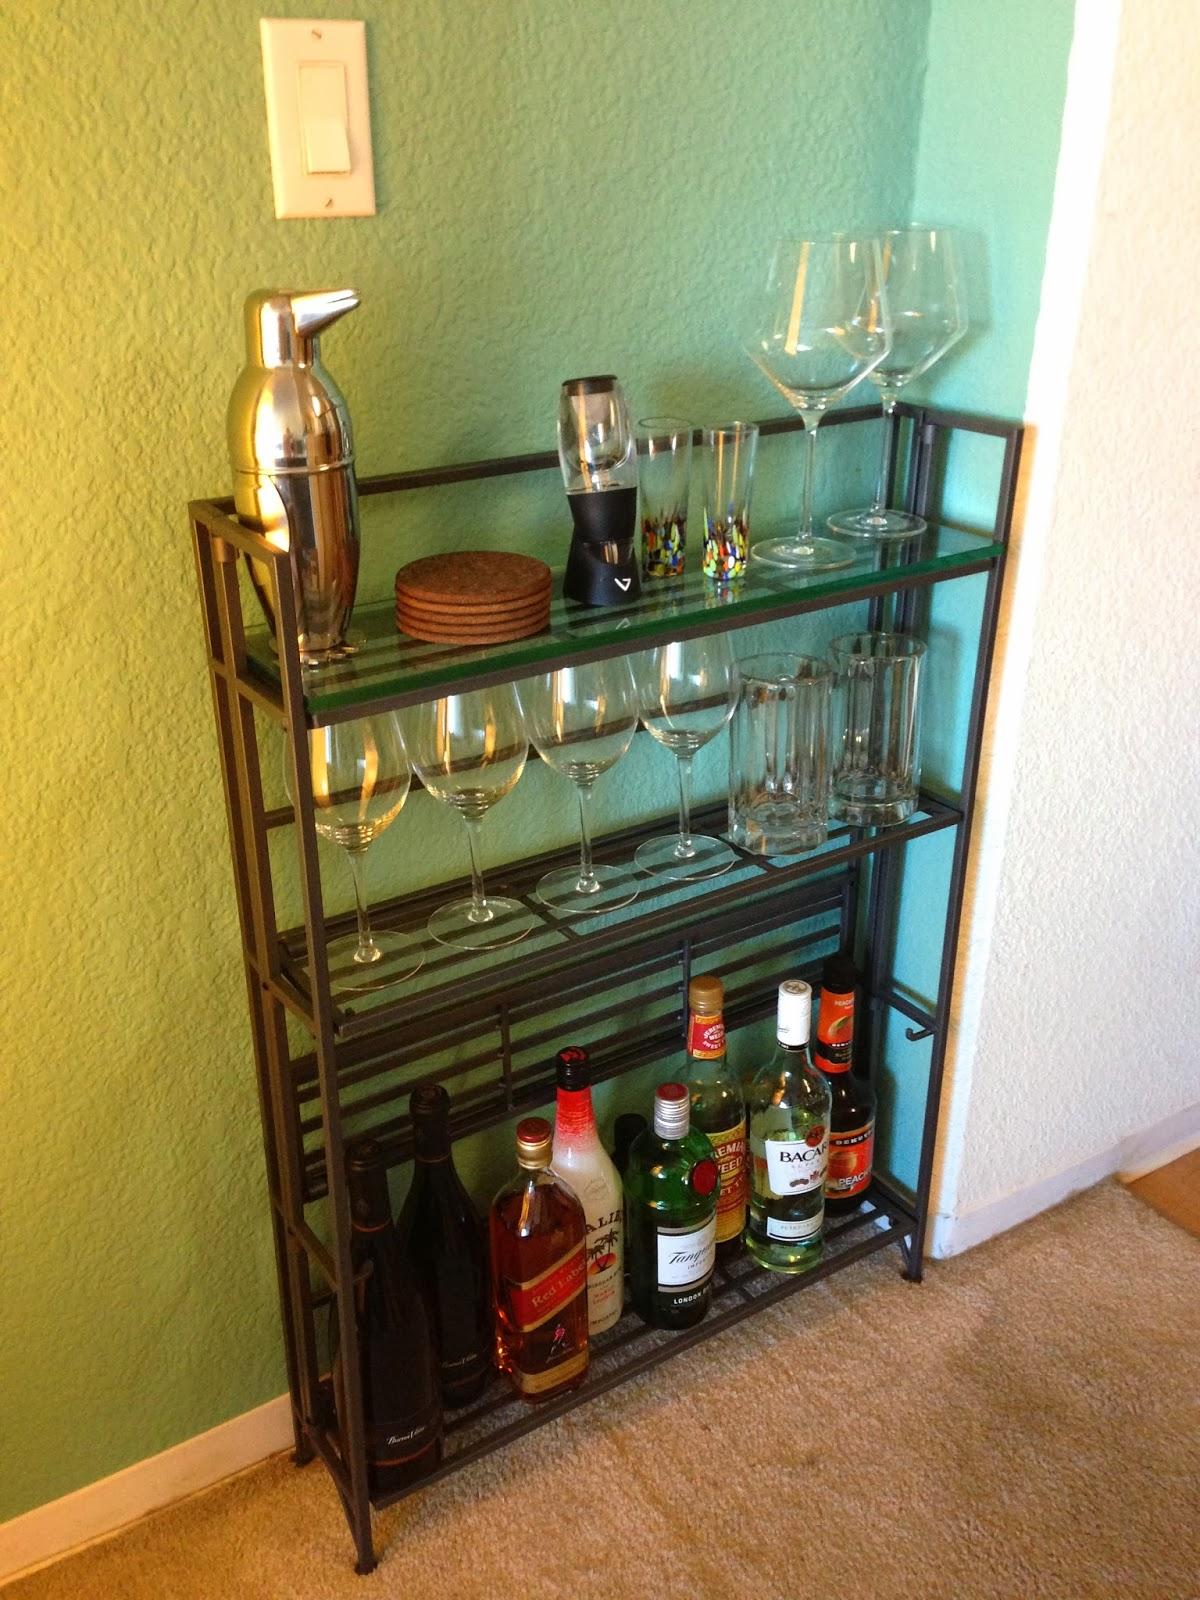 The Granola Chronicles studio mini bar